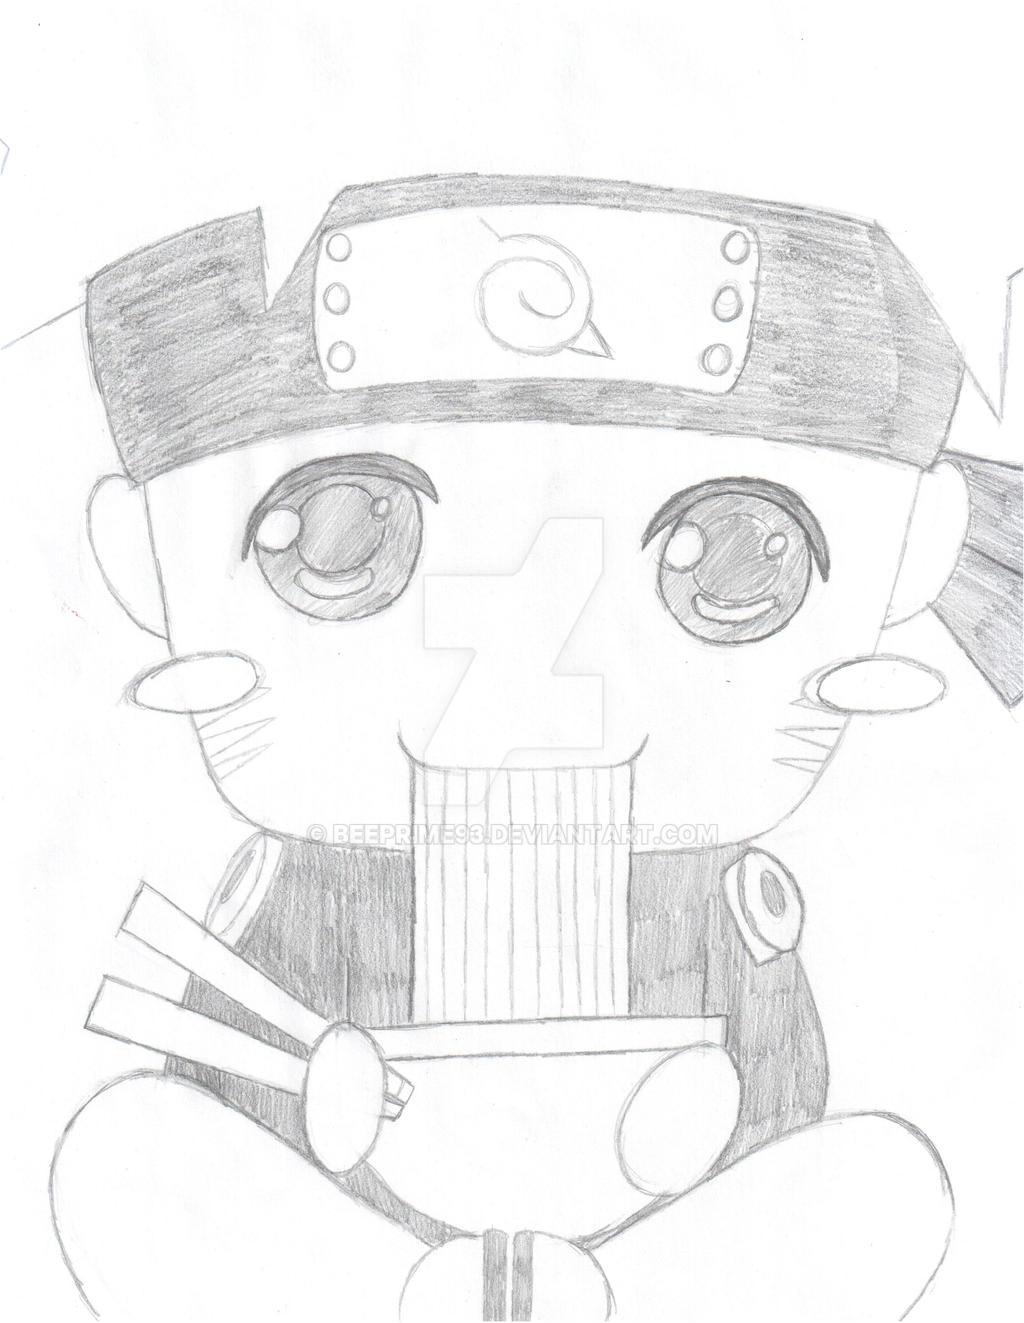 Chibi naruto pencil by beeprime93 on deviantart